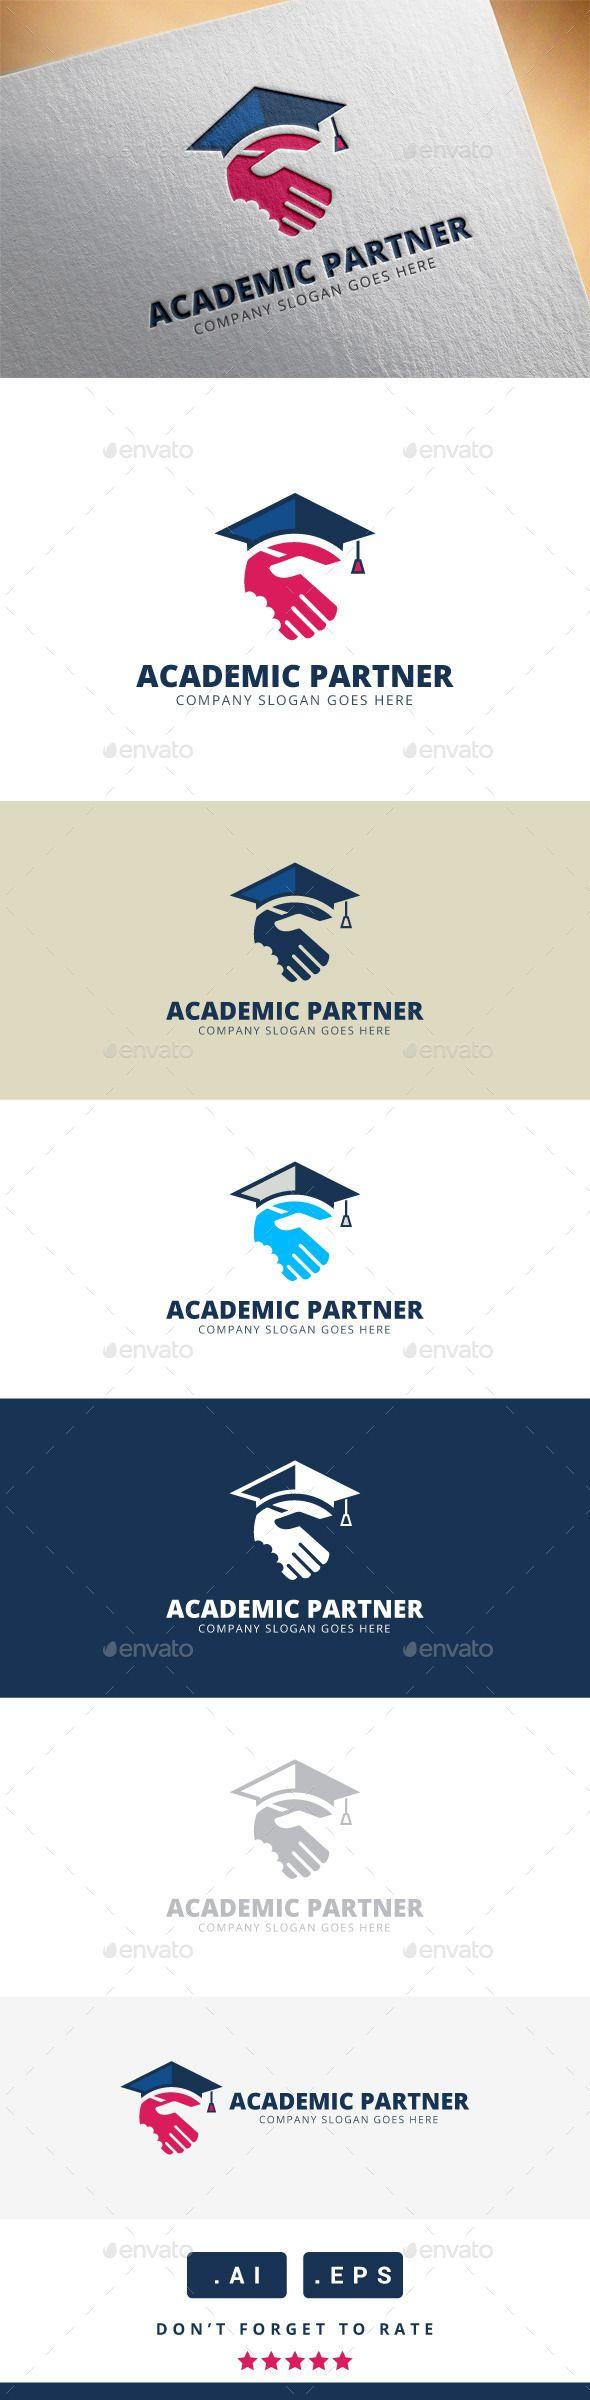 Academic Partner Logo — Vector EPS #corporate #creative